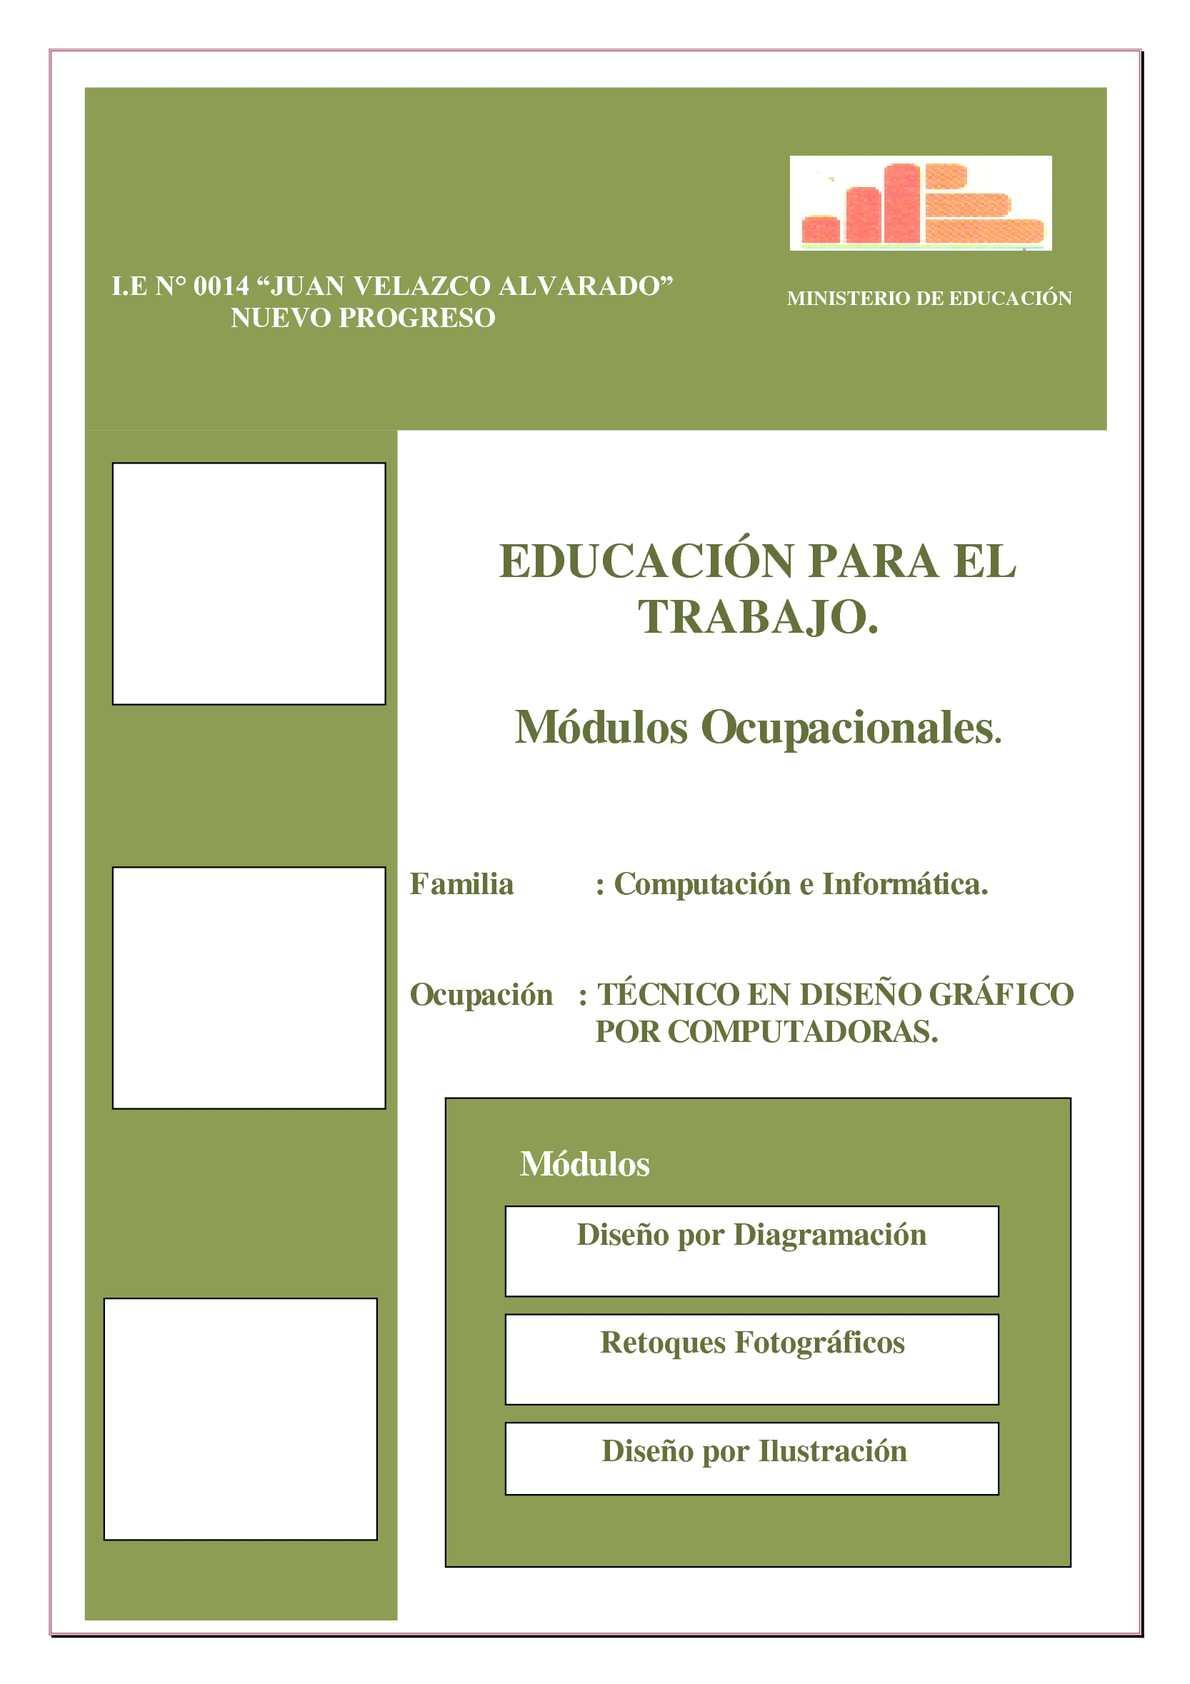 Modulo Ocupacional Diseño Grafico Asistido por Pc